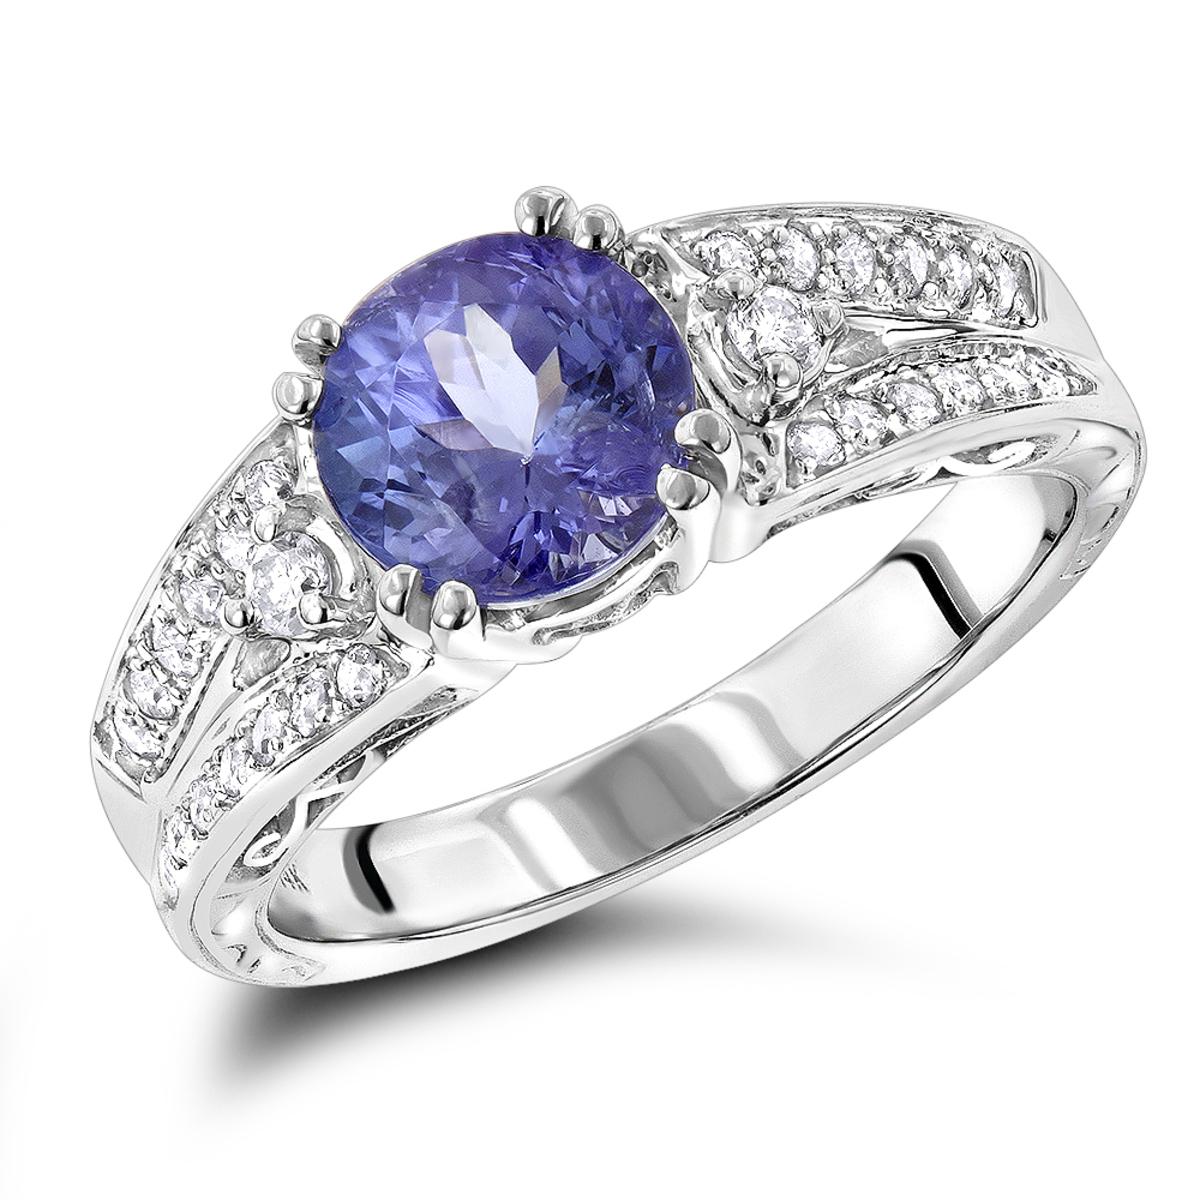 Diamond Tanzanite Engagement Ring for Women 14K Gold 0.3 ctd 1.5ctt